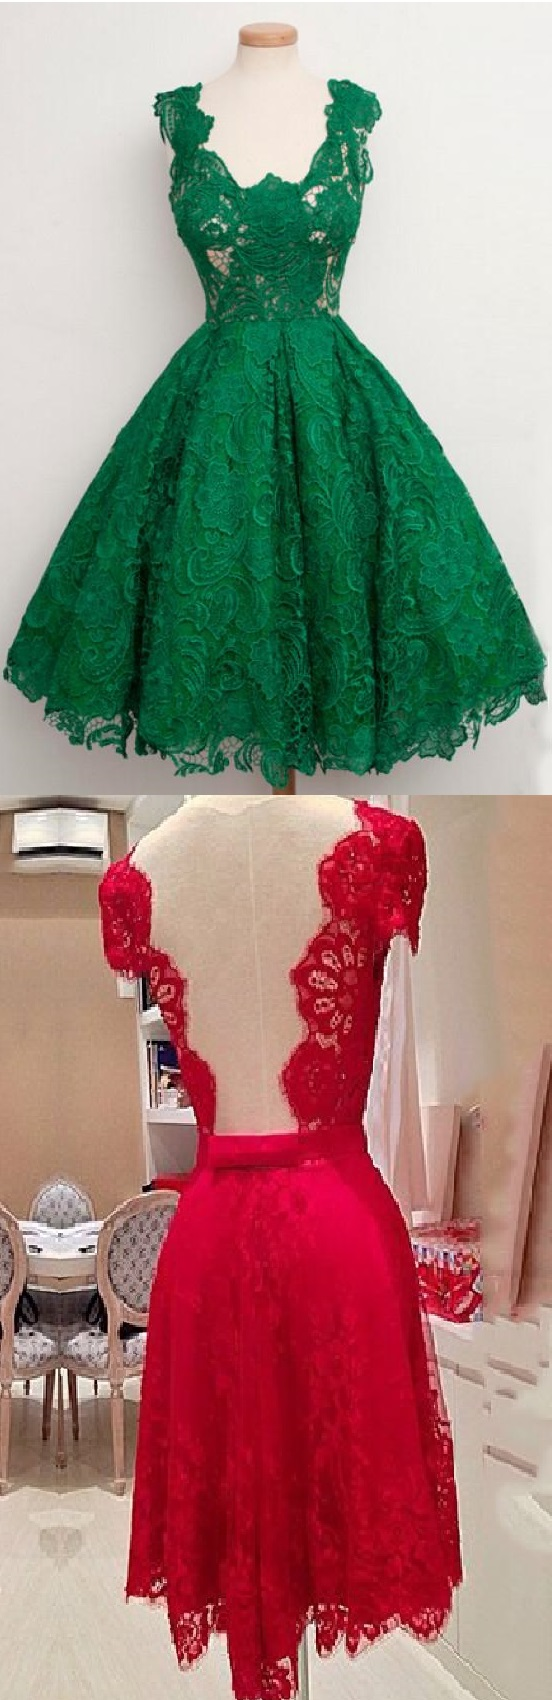 Green prom dresses sleeveless v neck alineprincess lace short